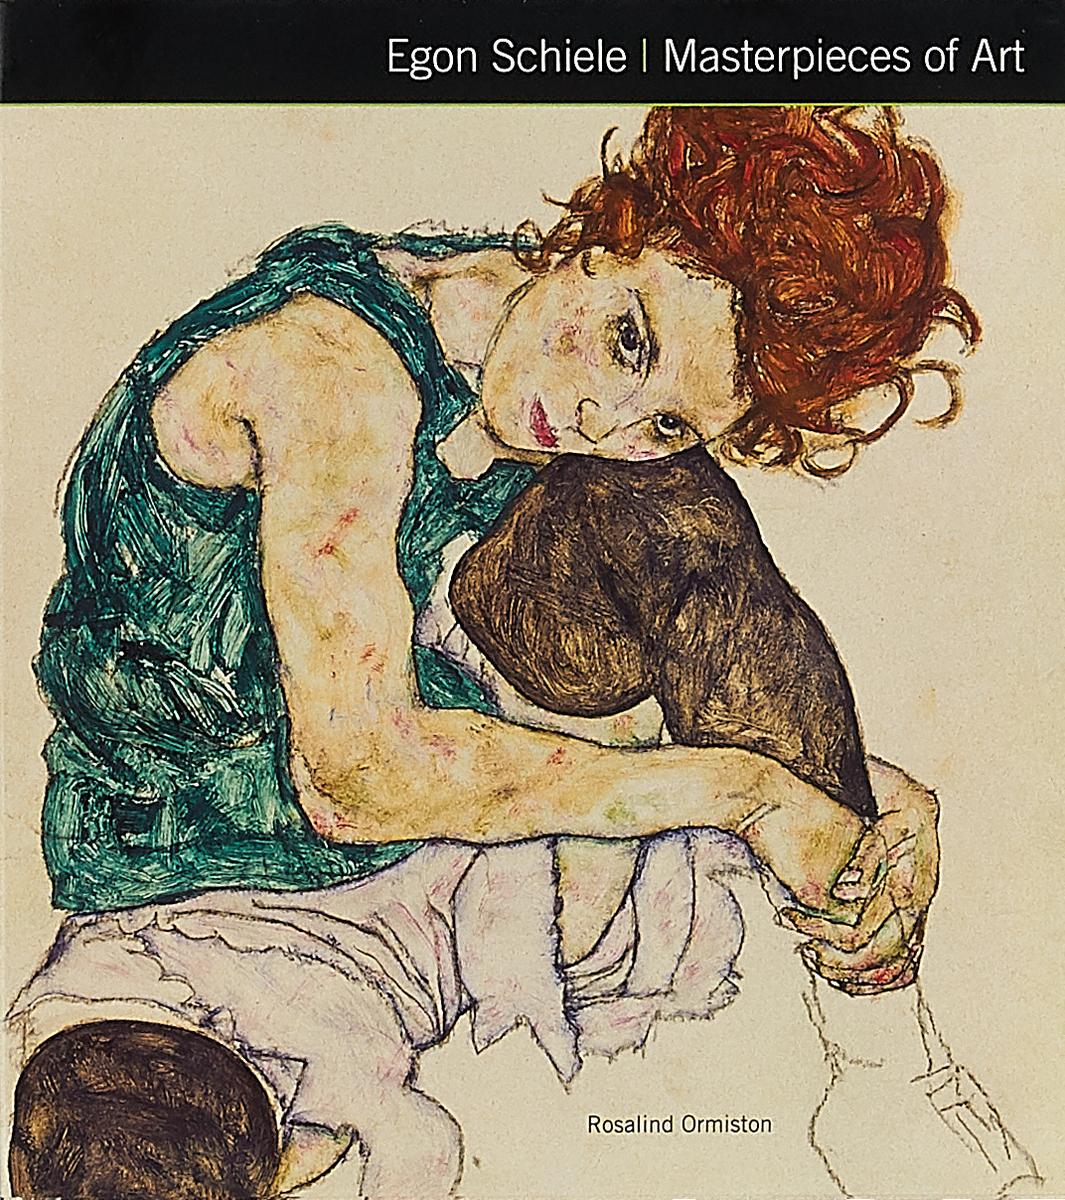 Egon Schiele / Masterpieces of Art schiele